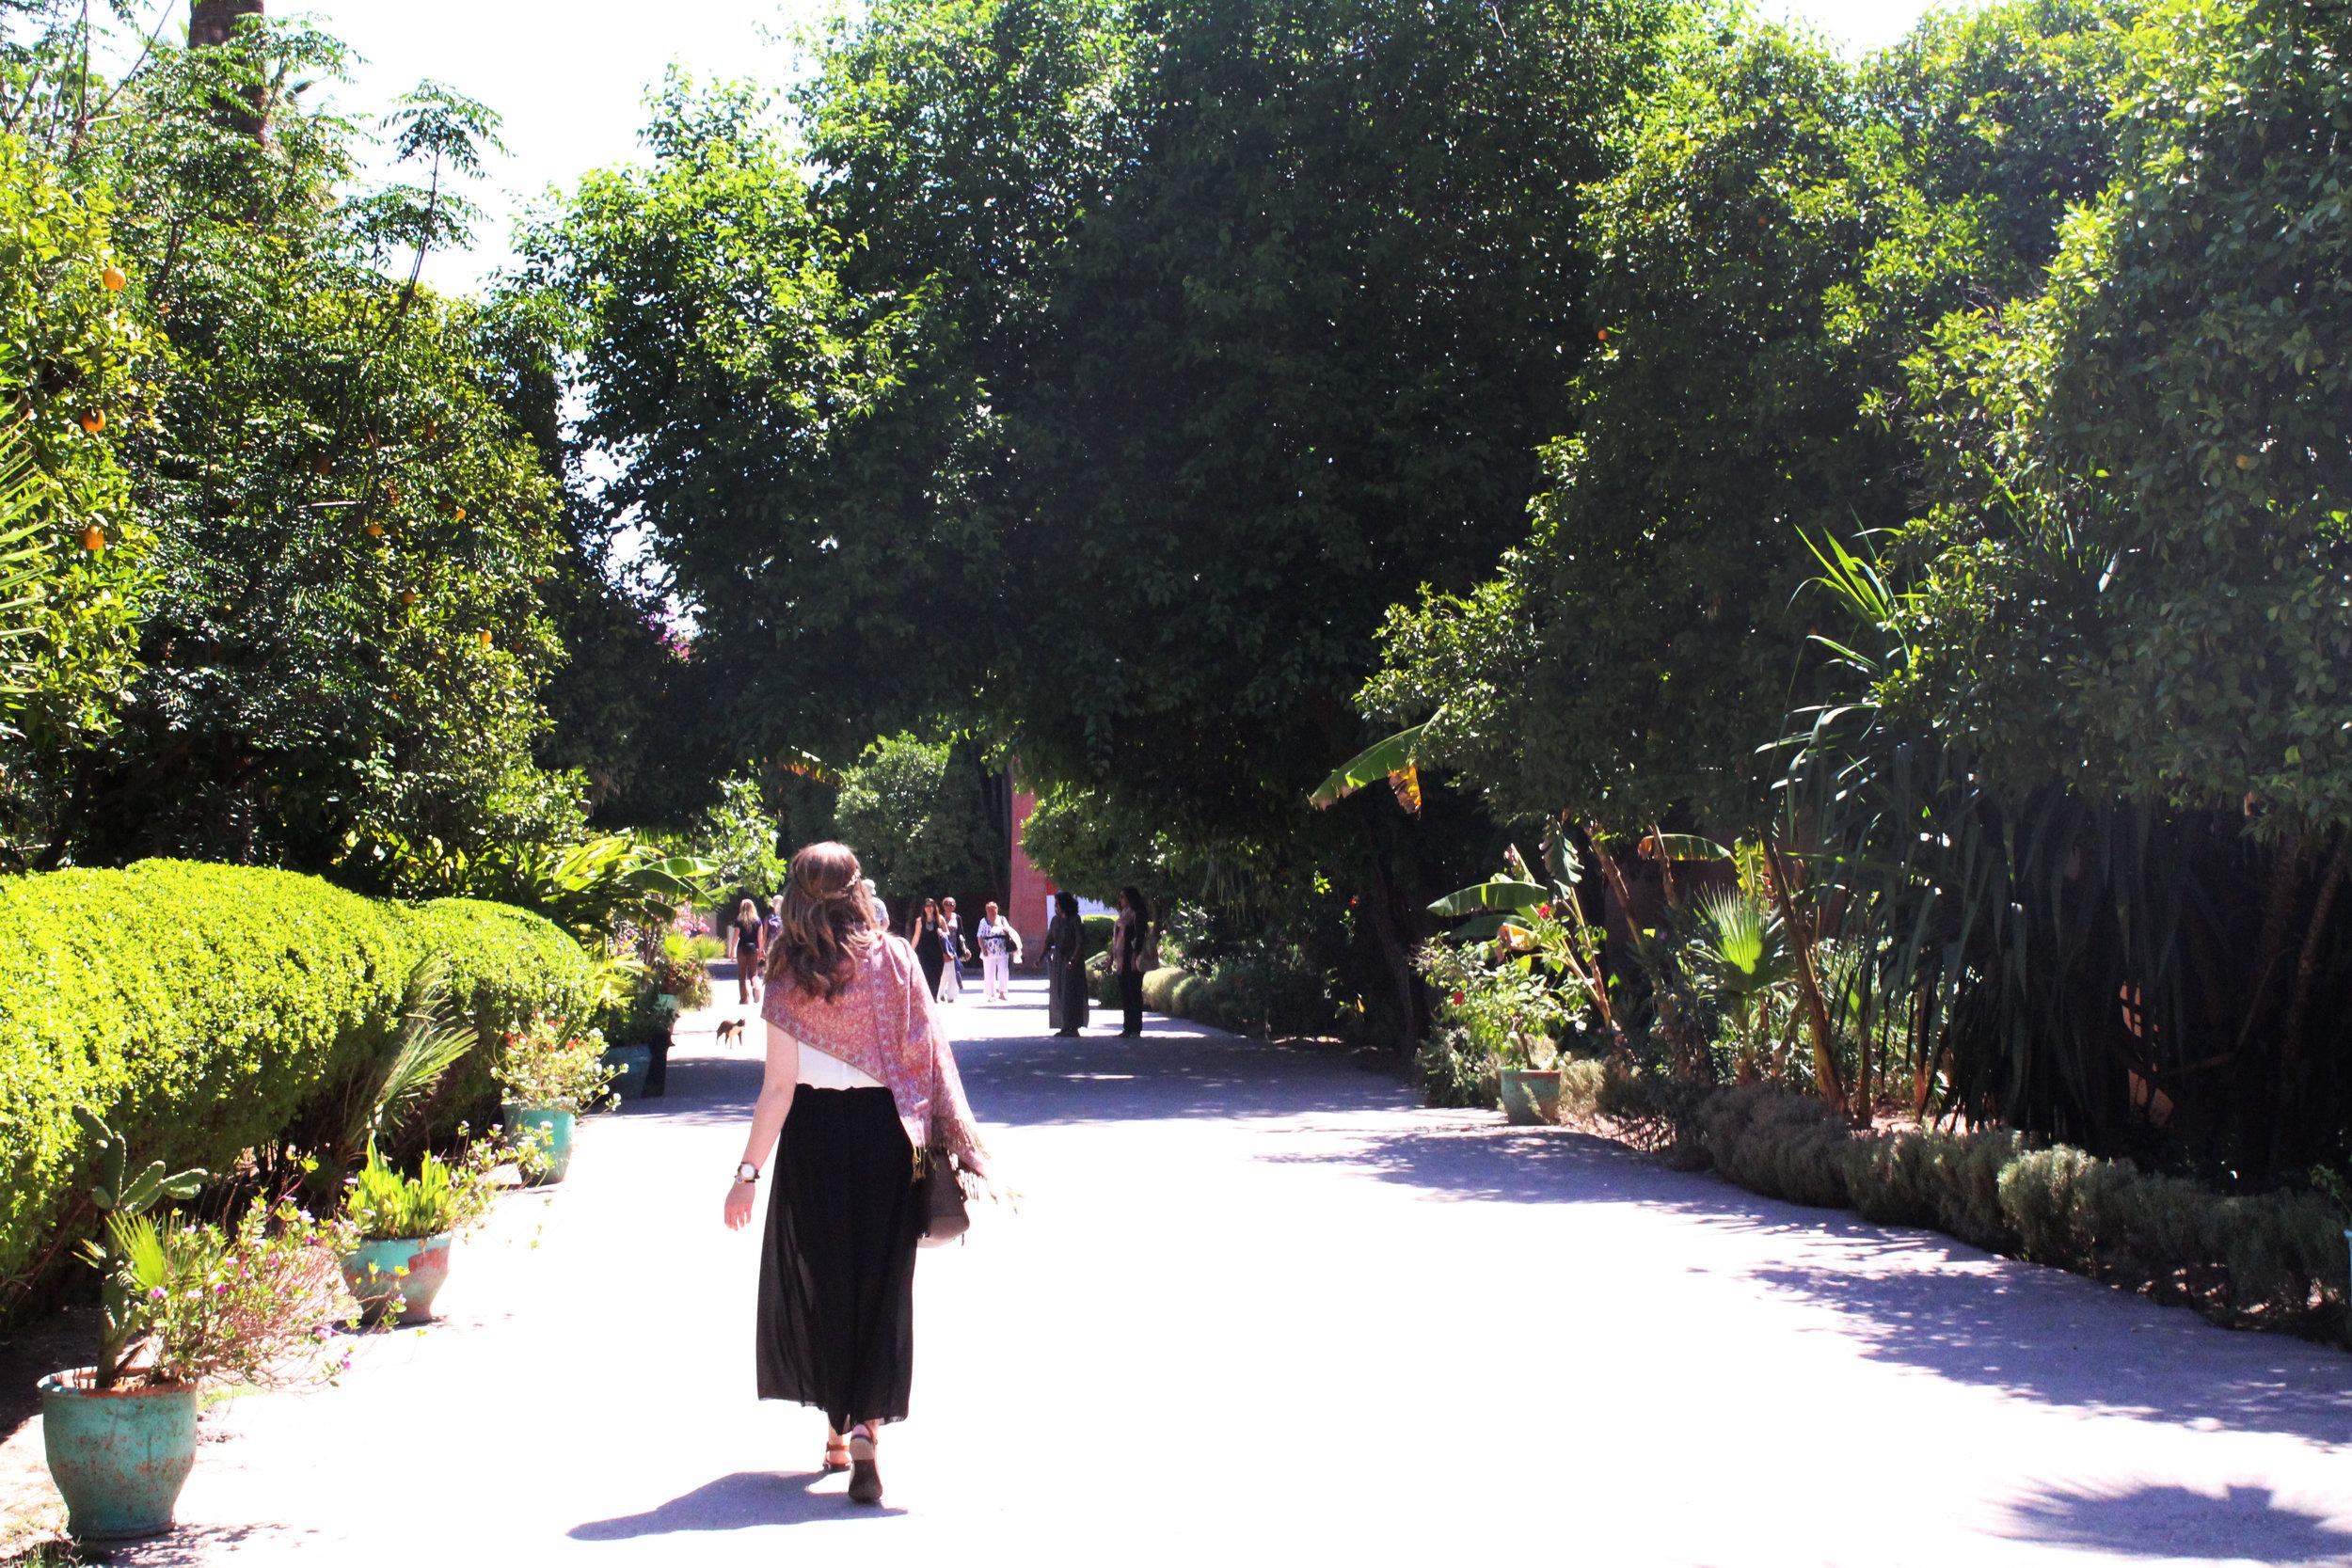 Enterance to the Bahia Palace